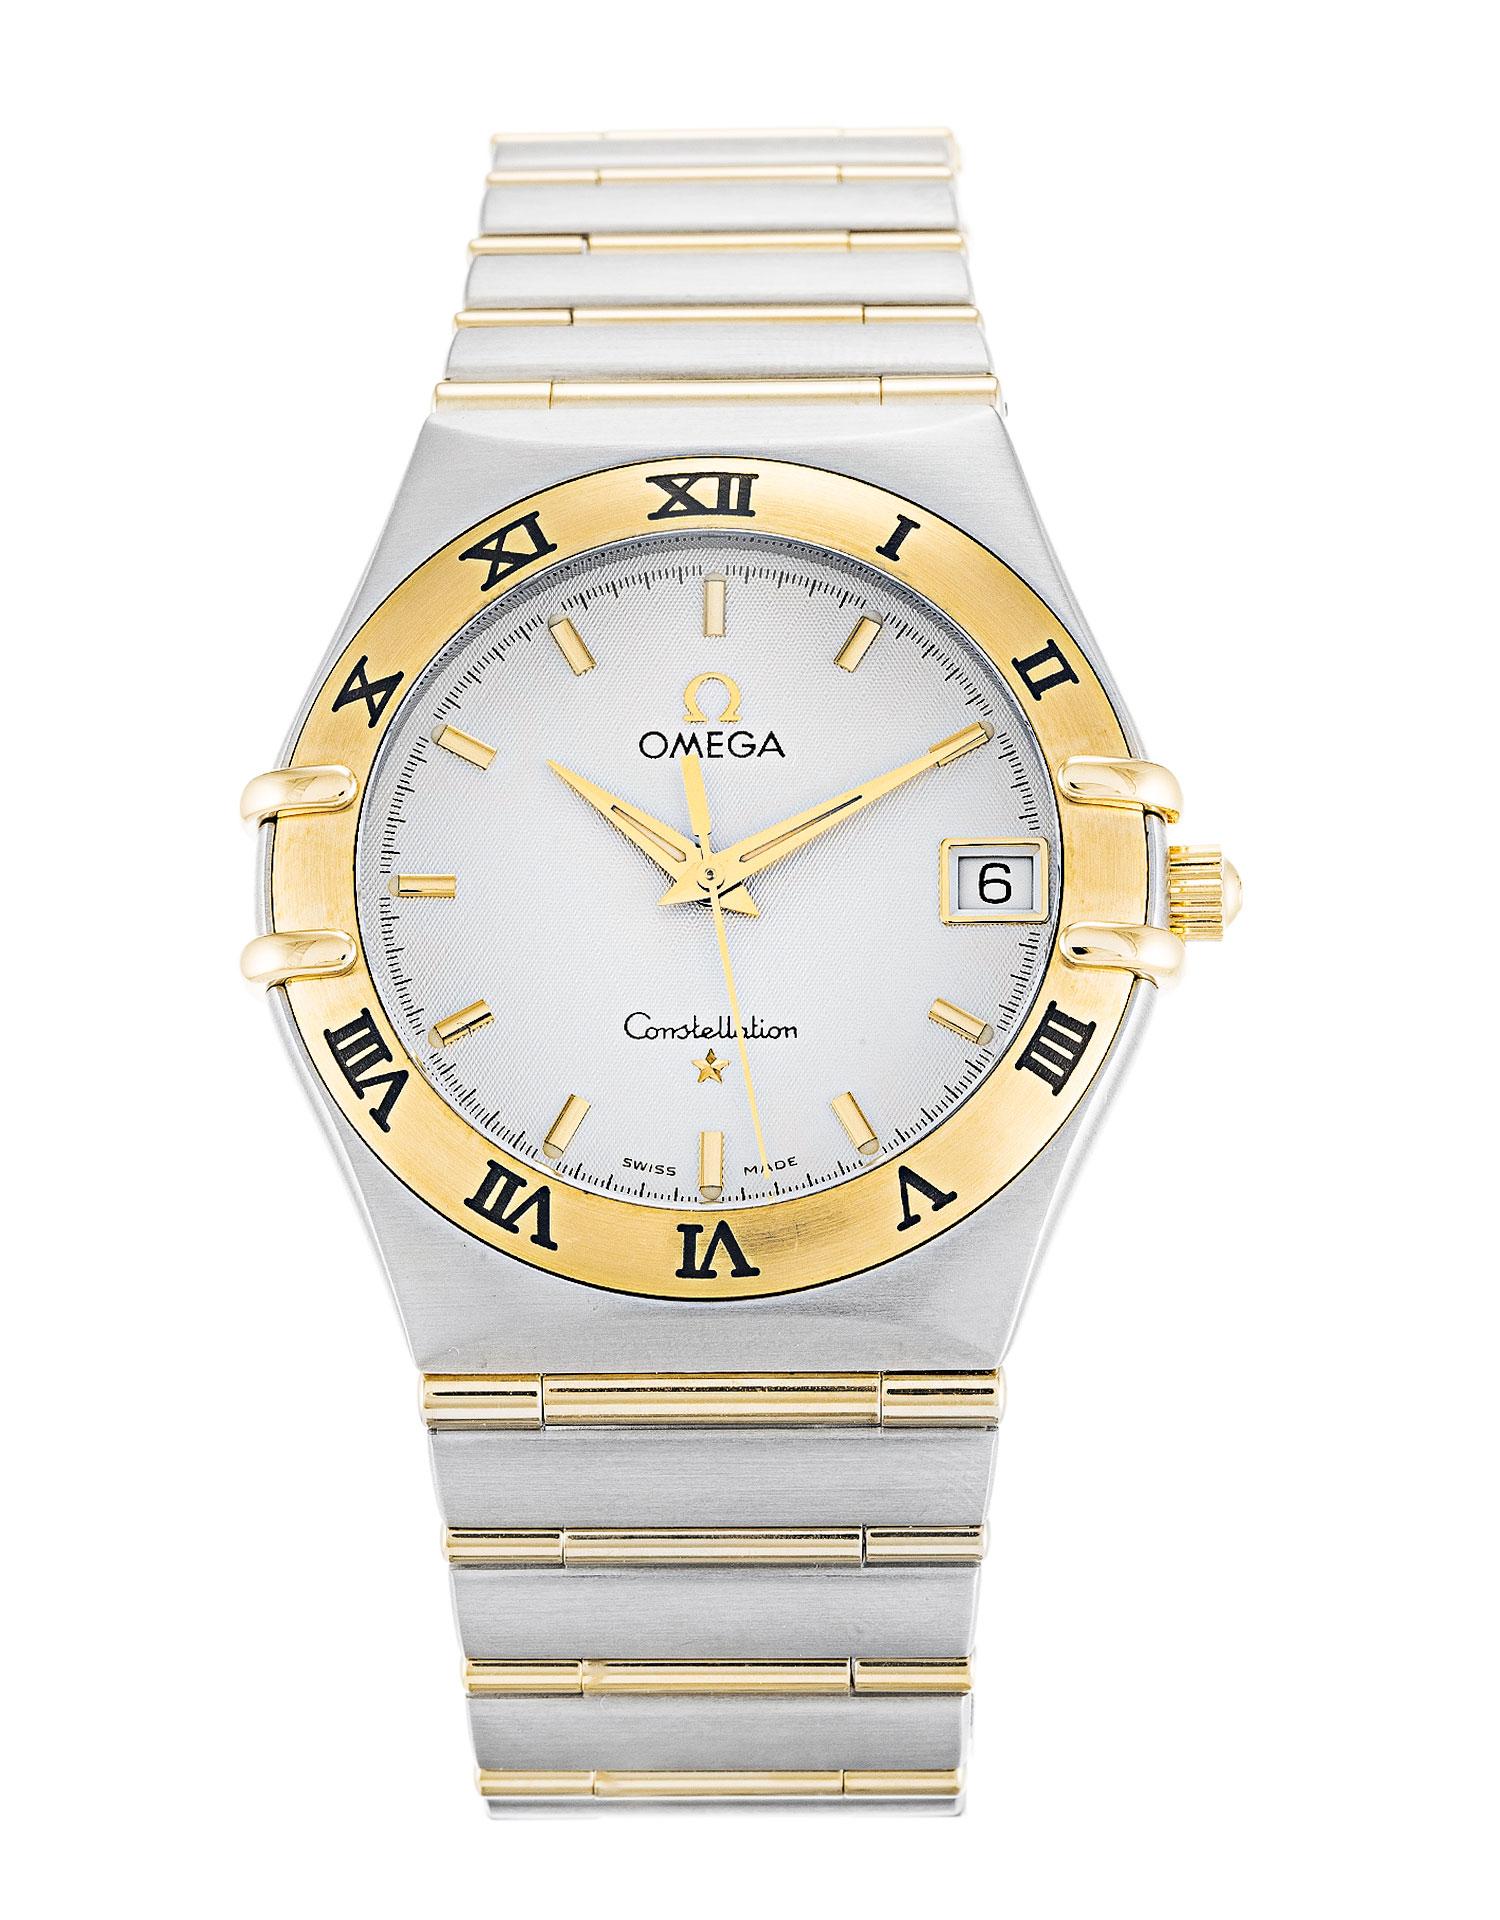 Omega Constellation 1212.30.00 Mens 33.5 Mm Steel & Yellow Gold Case Quartz Movement – iapac.to